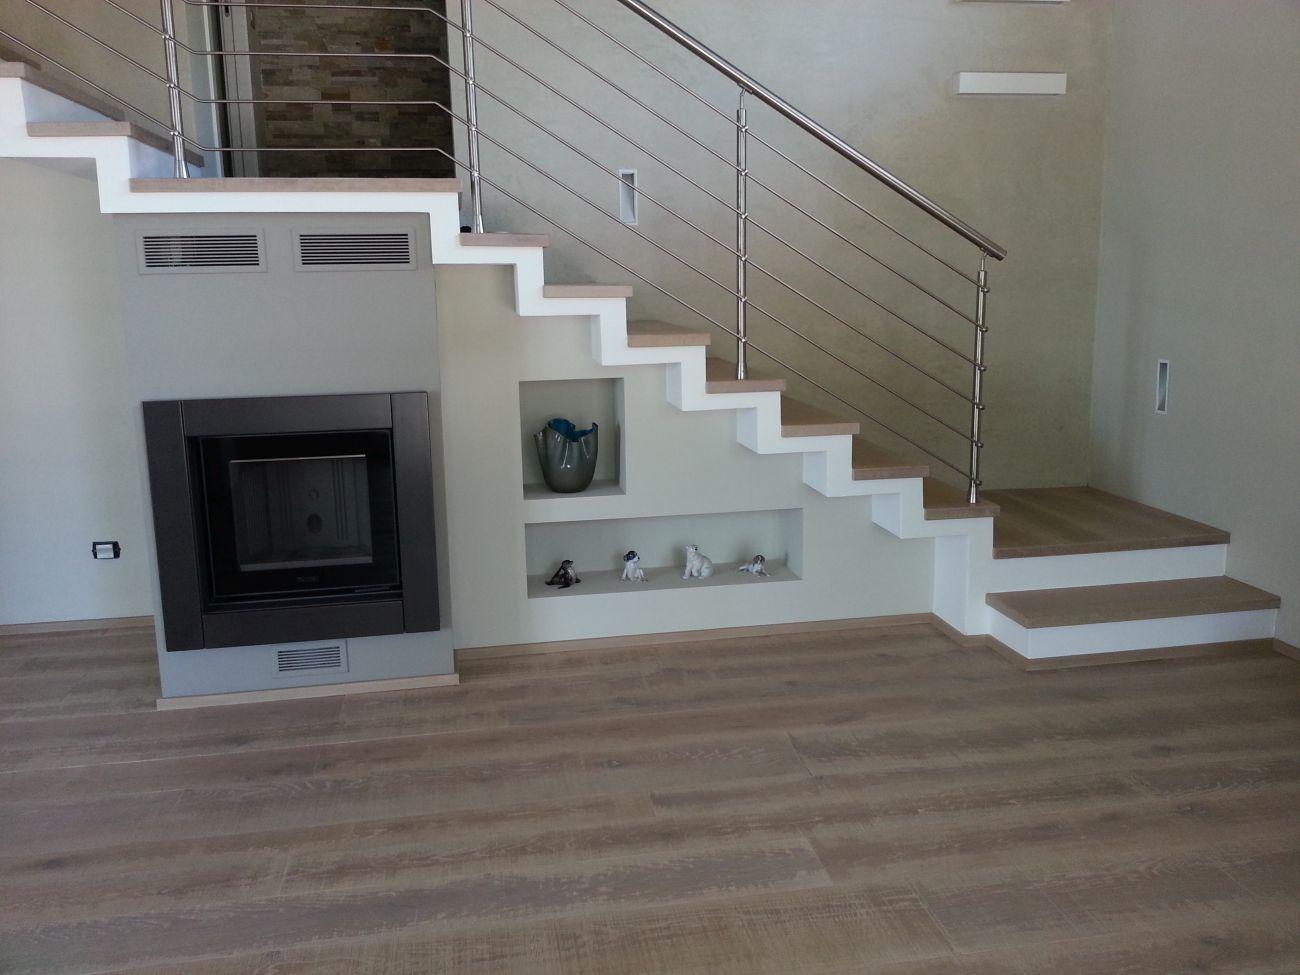 Pavimenti interni moderni pavimenti moderni cerca con for Pavimenti moderni per interni